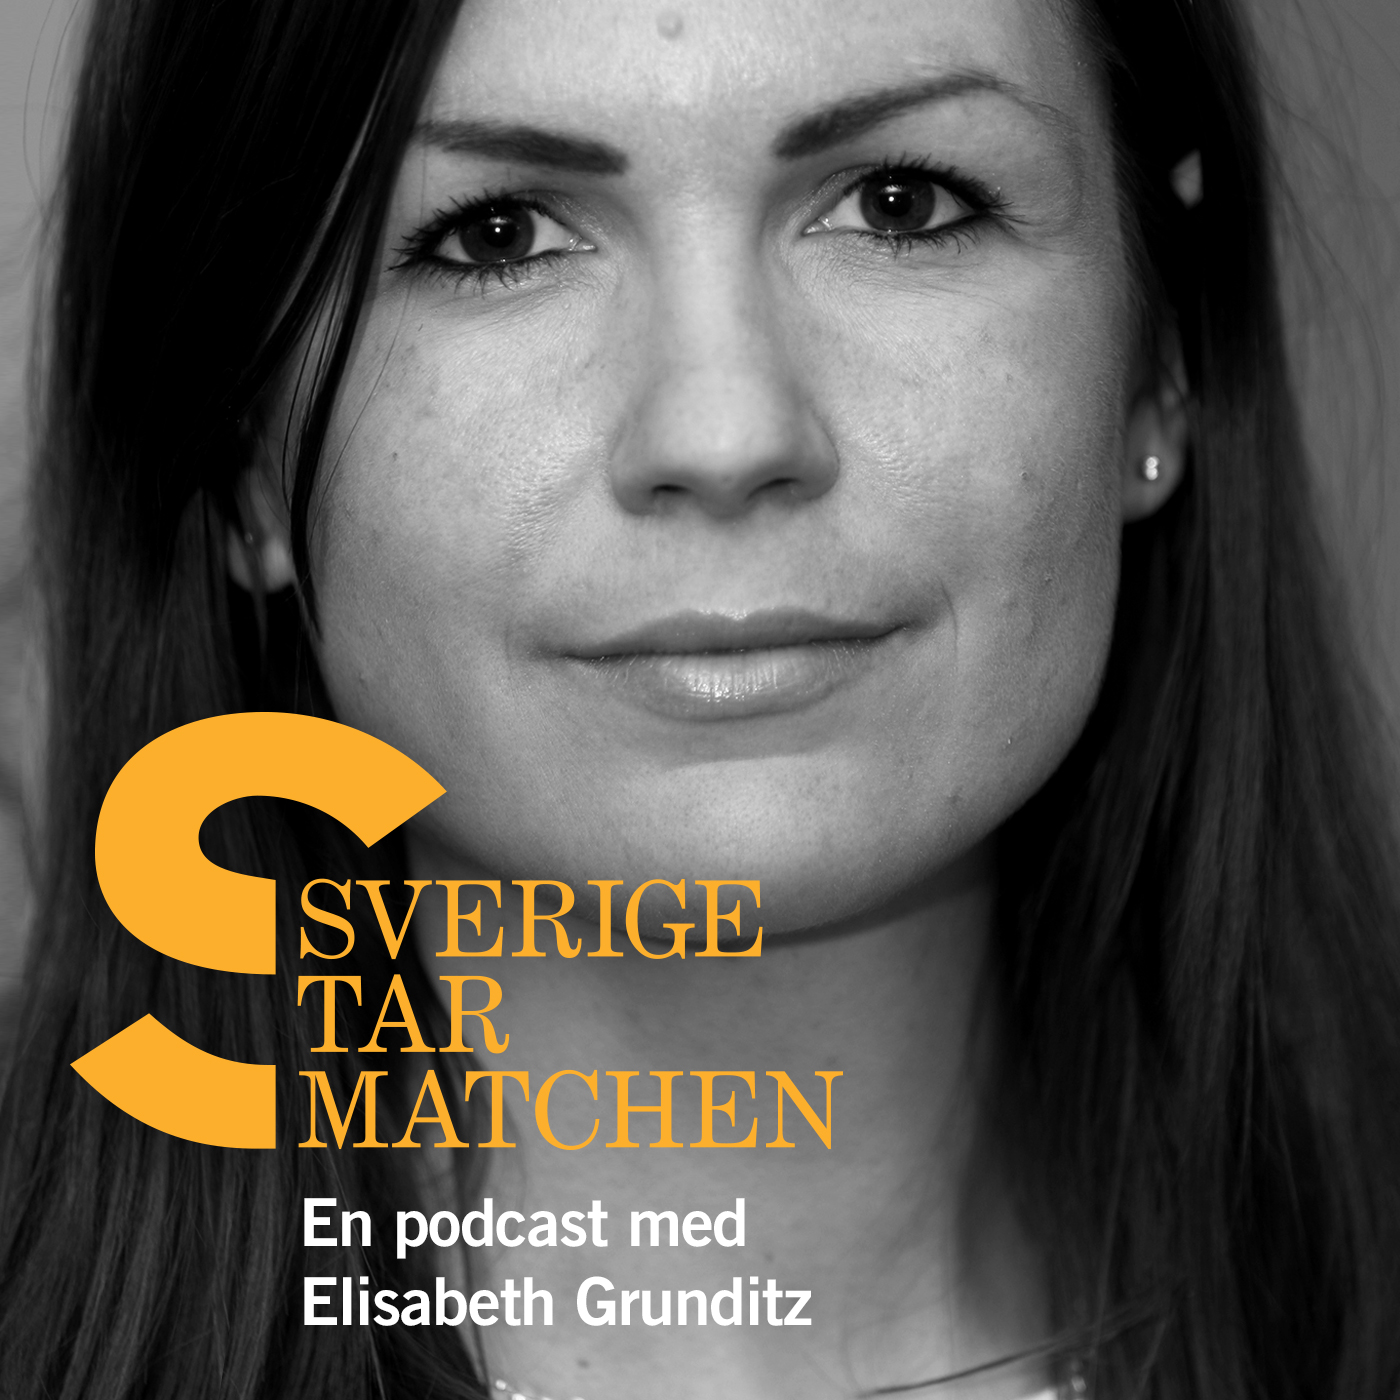 Sverige tar matchen